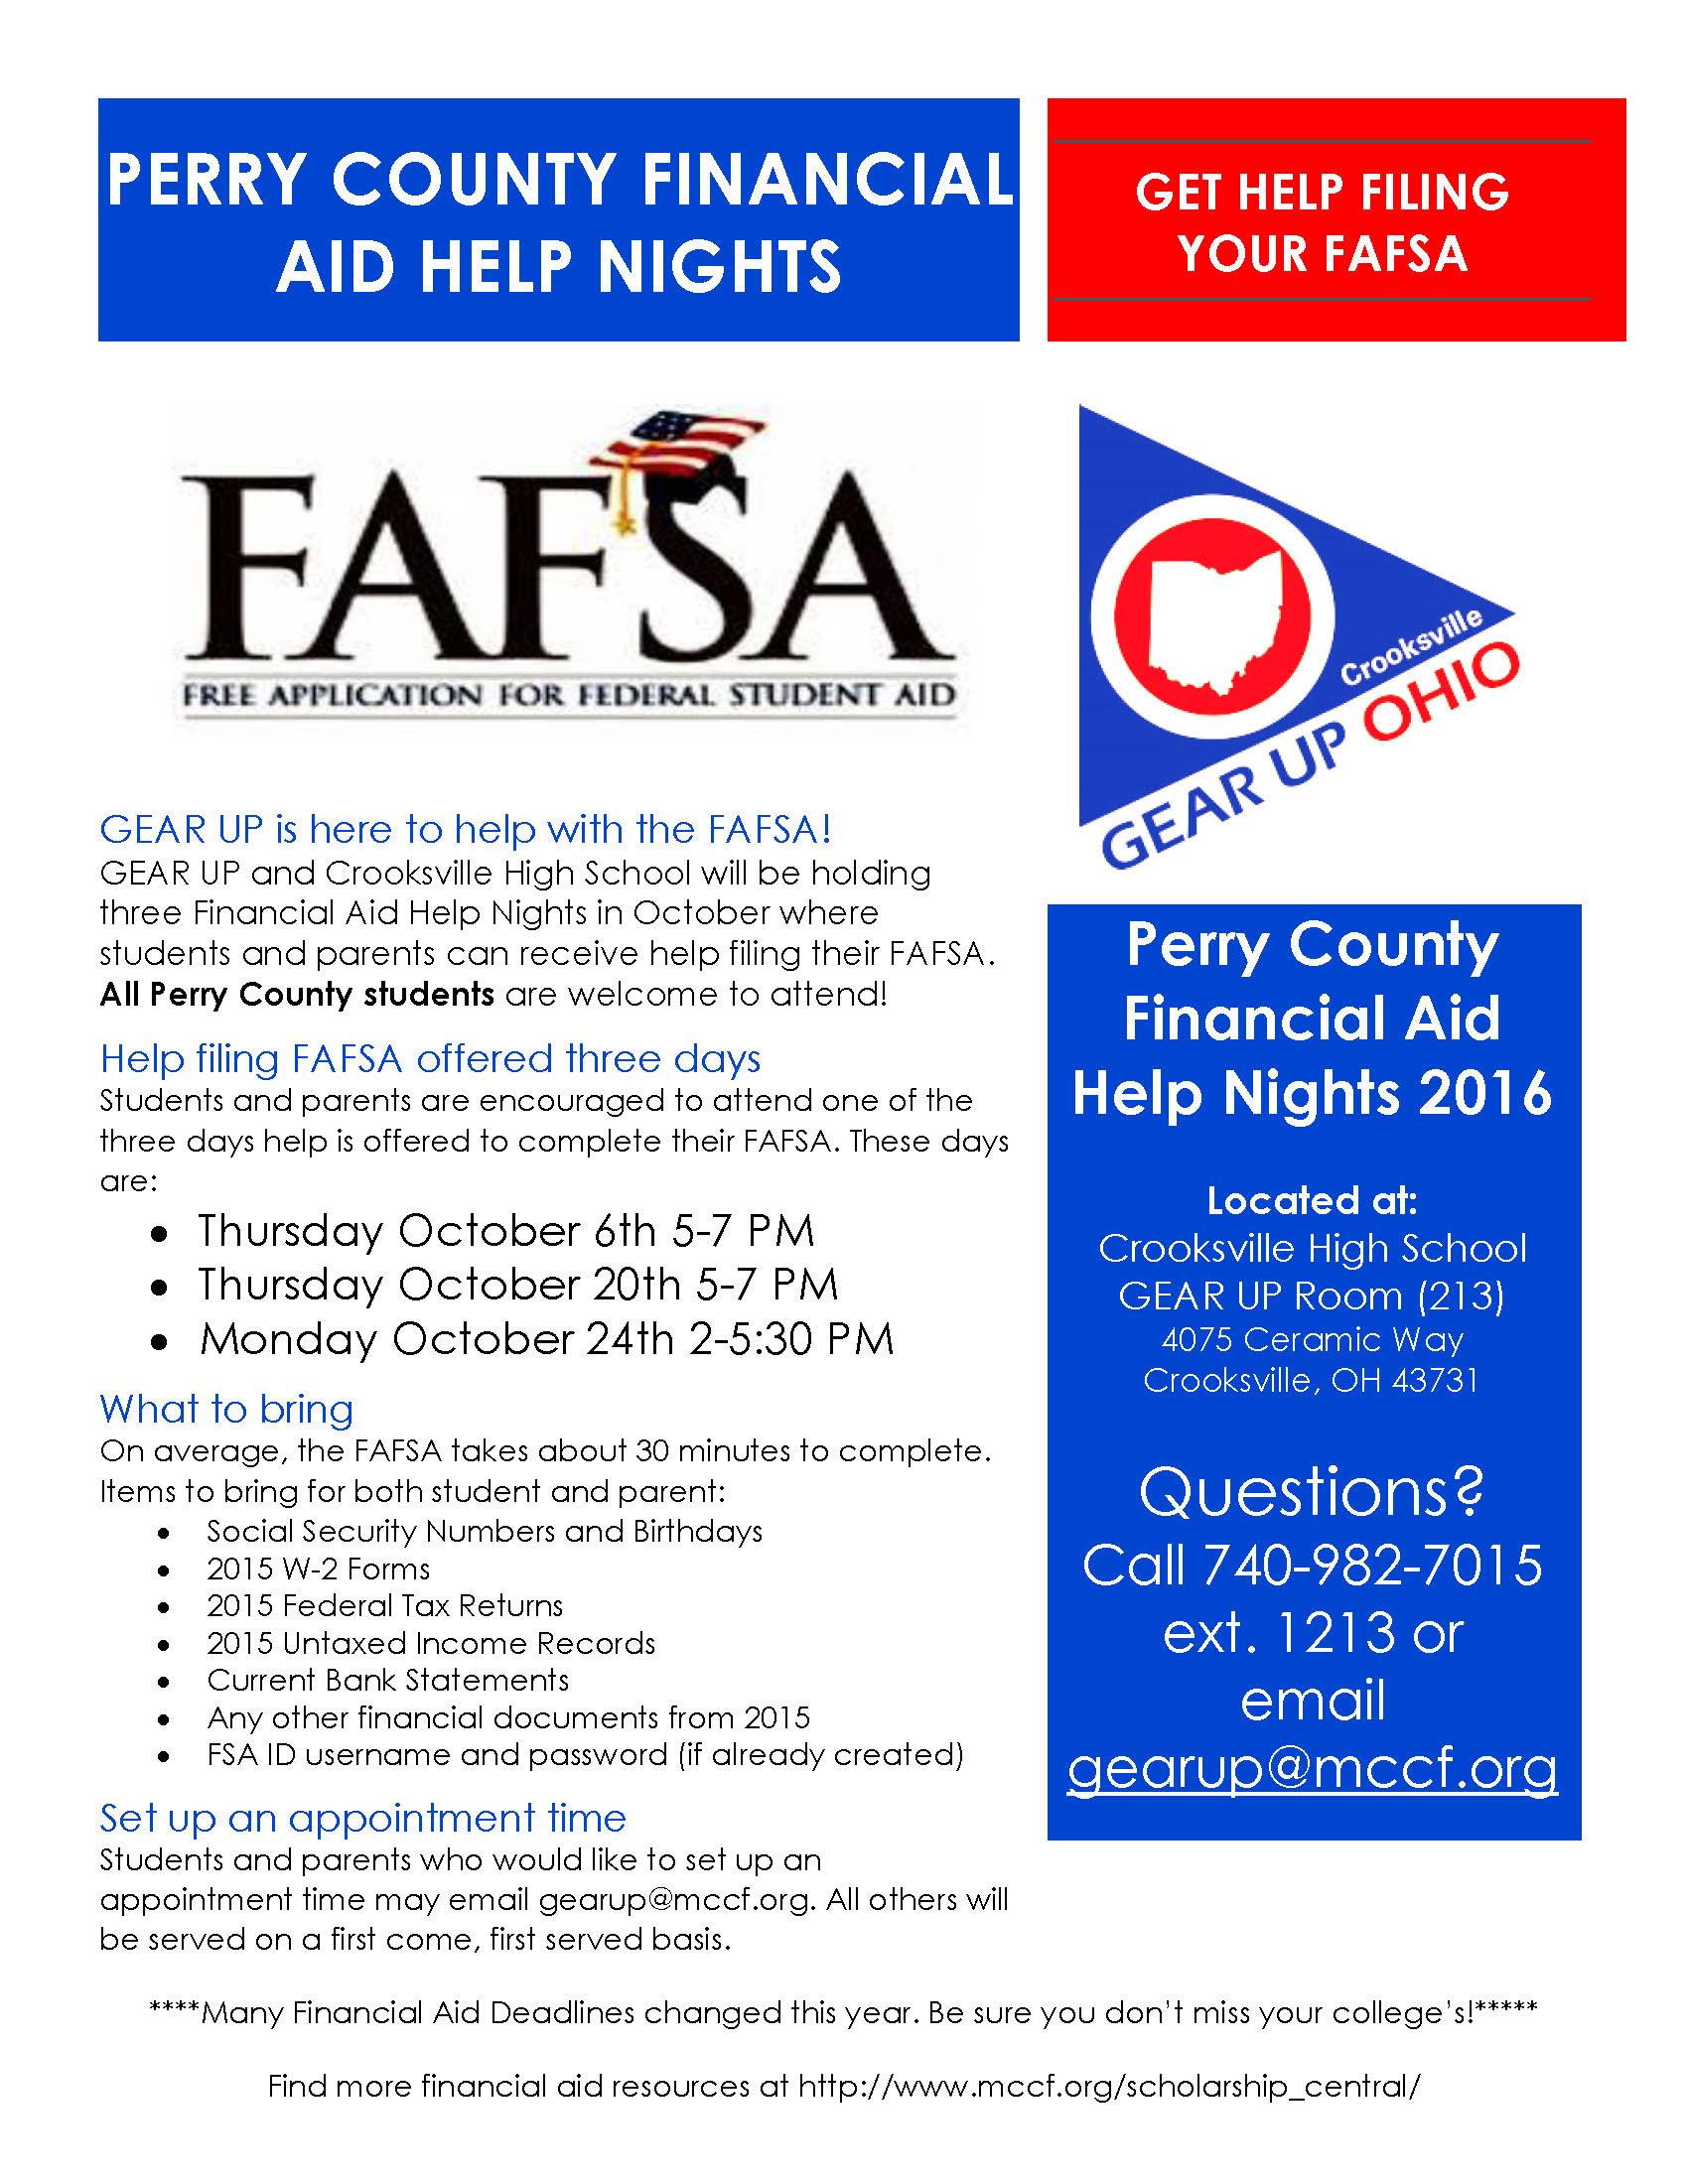 Financial Aid Help Nights - Crooksville High School